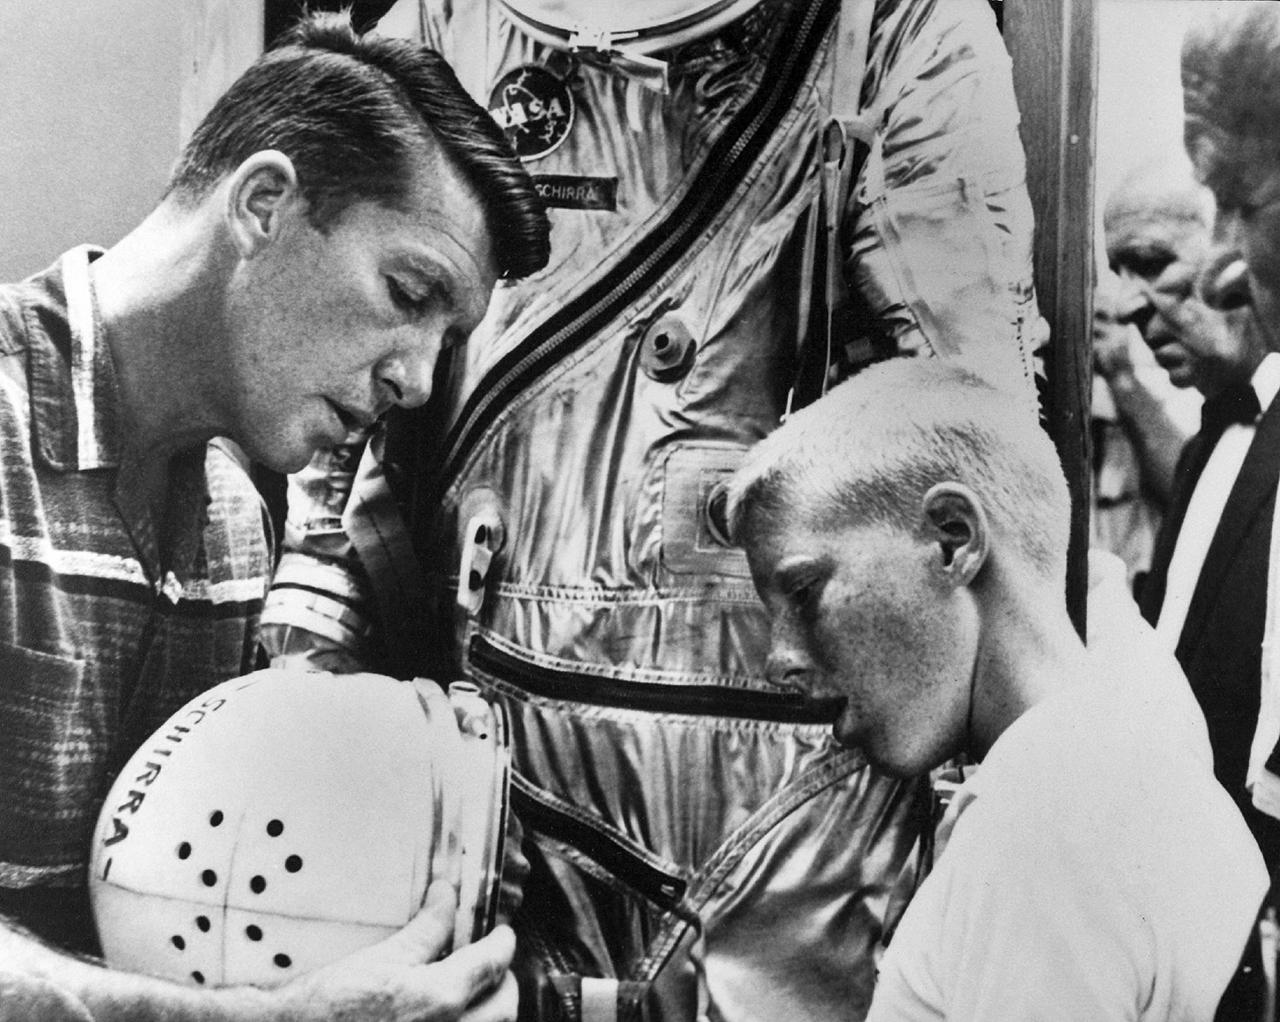 1962 nasa launch